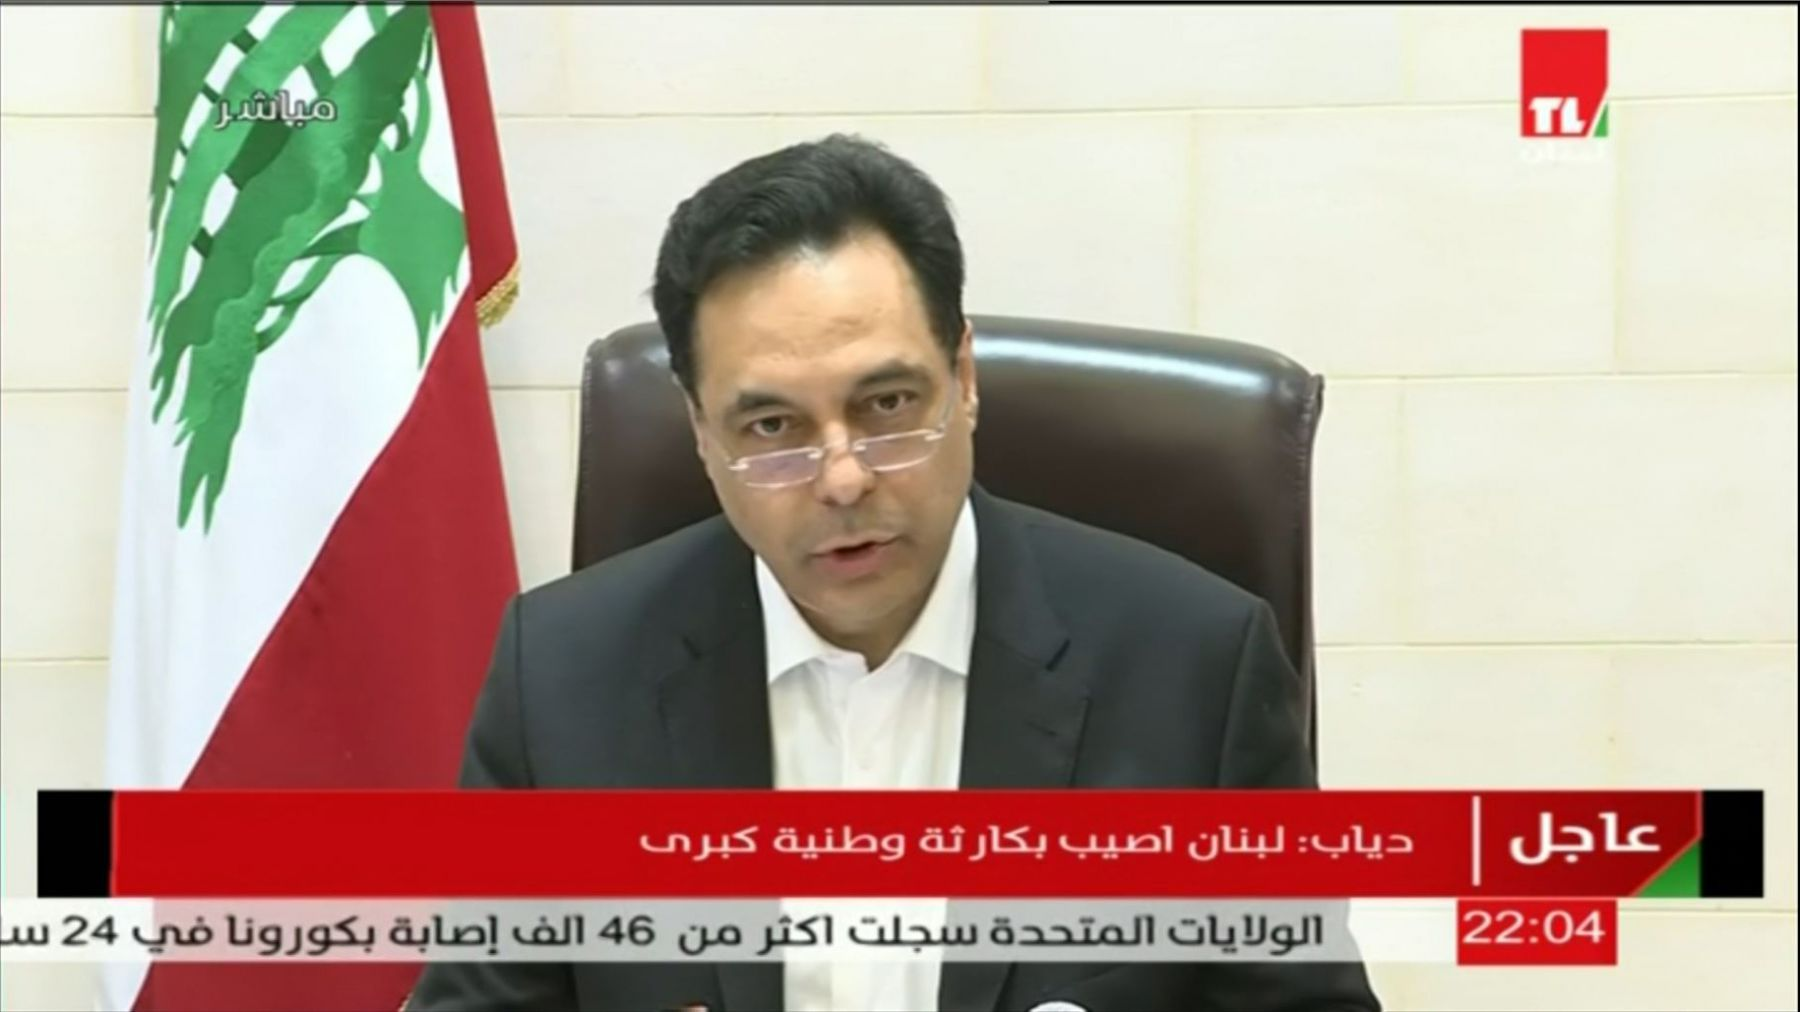 AFP/Télé Liban